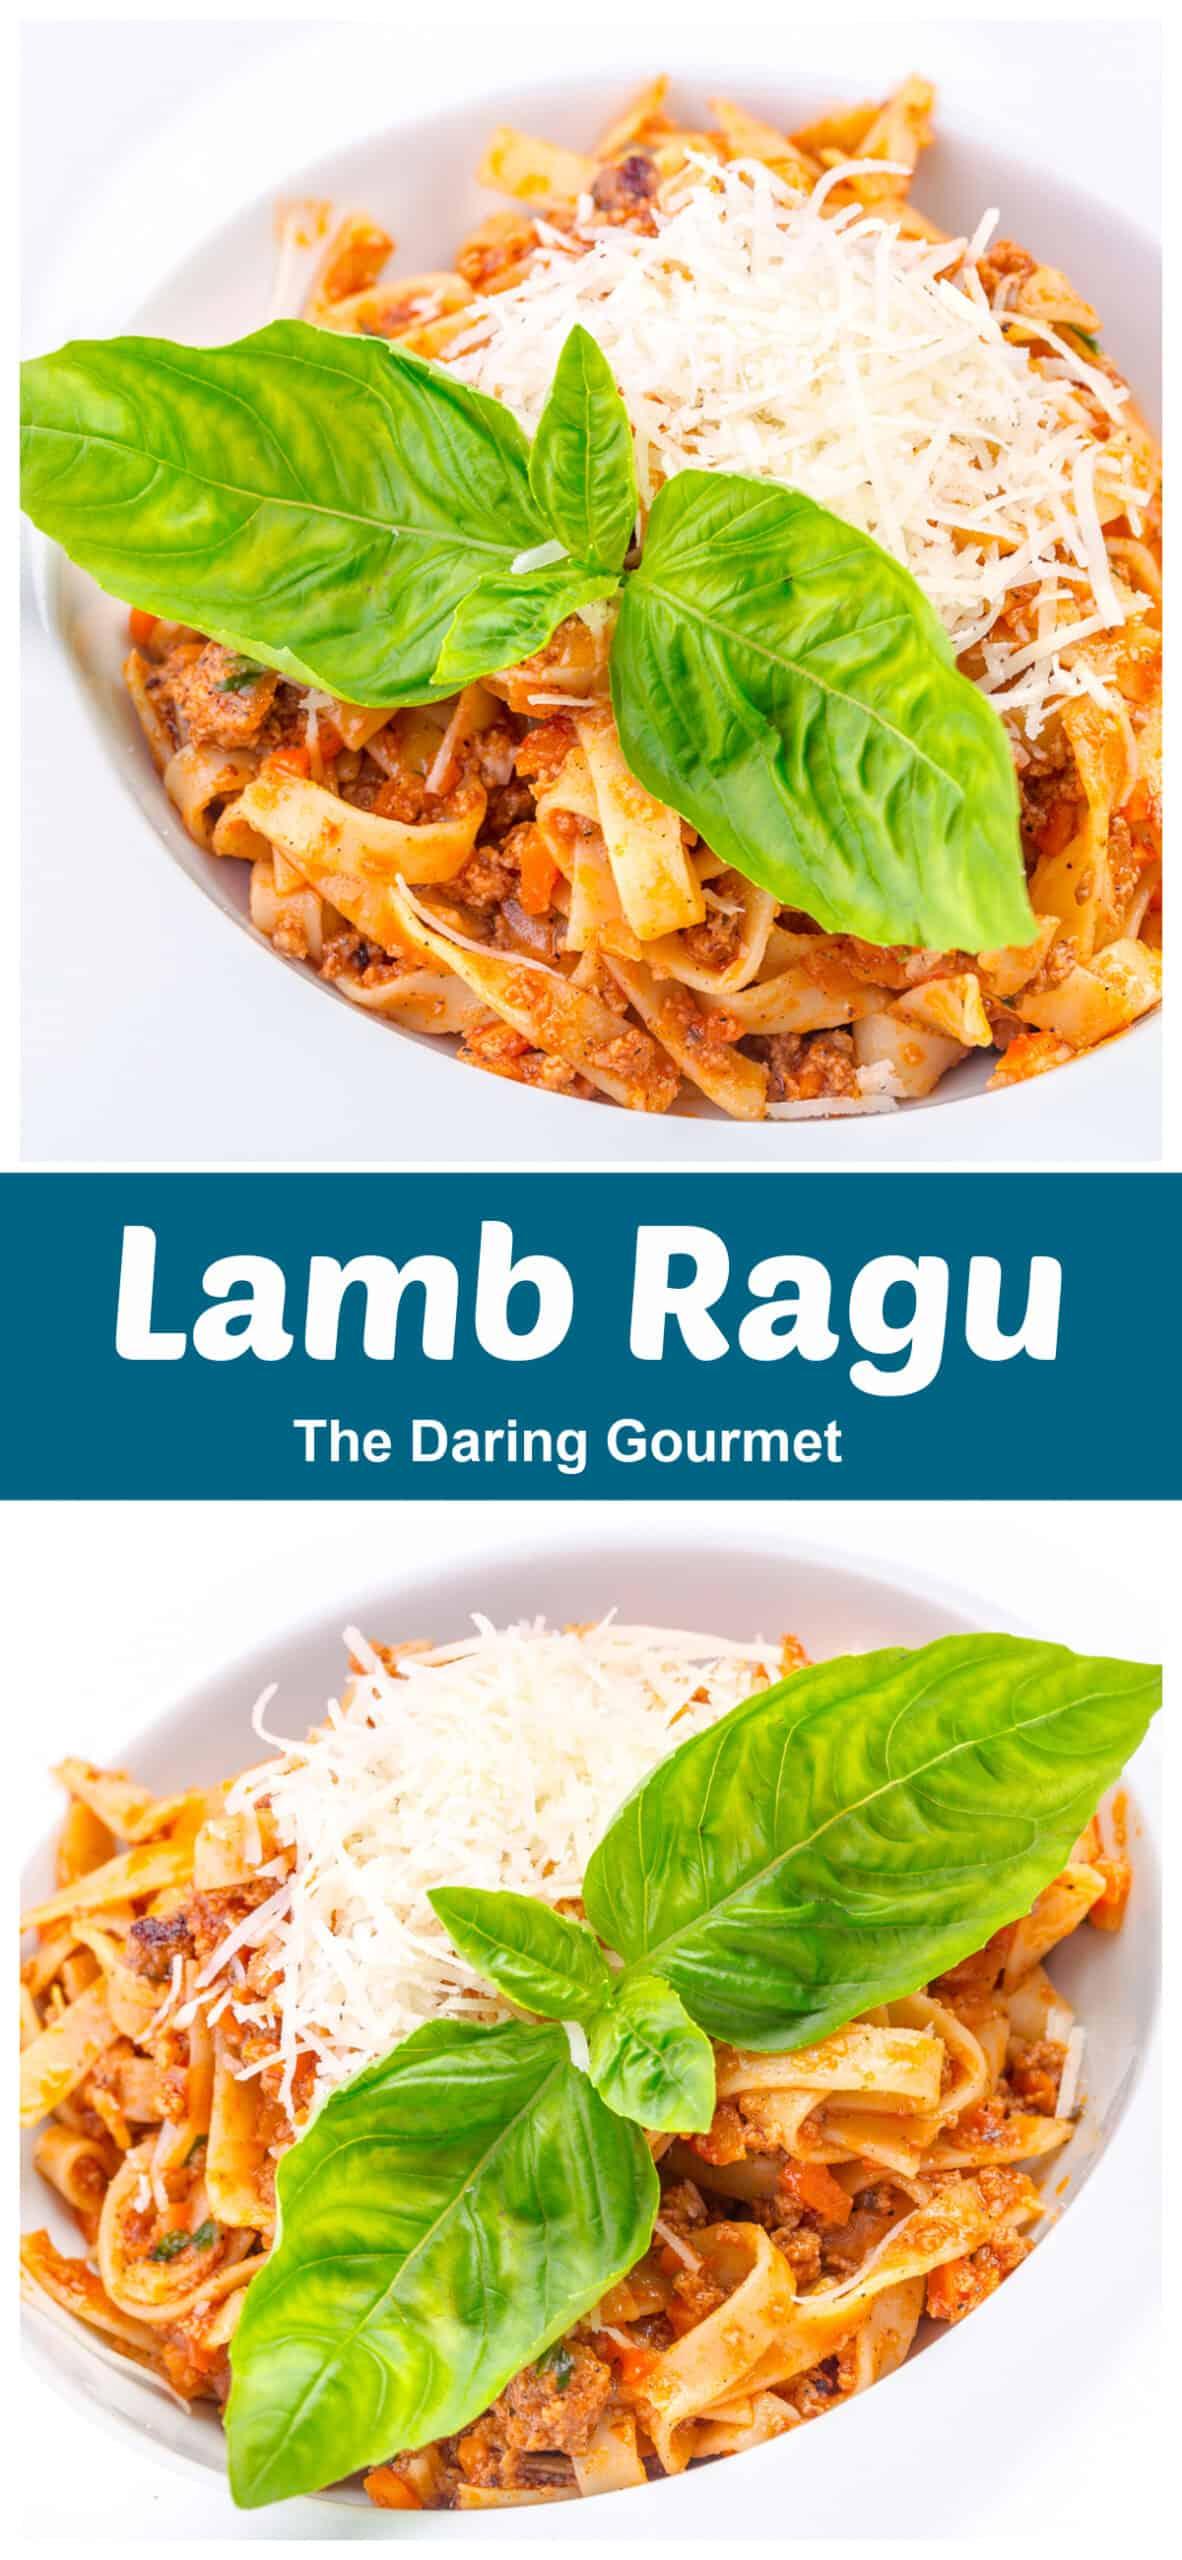 lamb ragu recipe bolognese italian best red wine carrots celery bacon